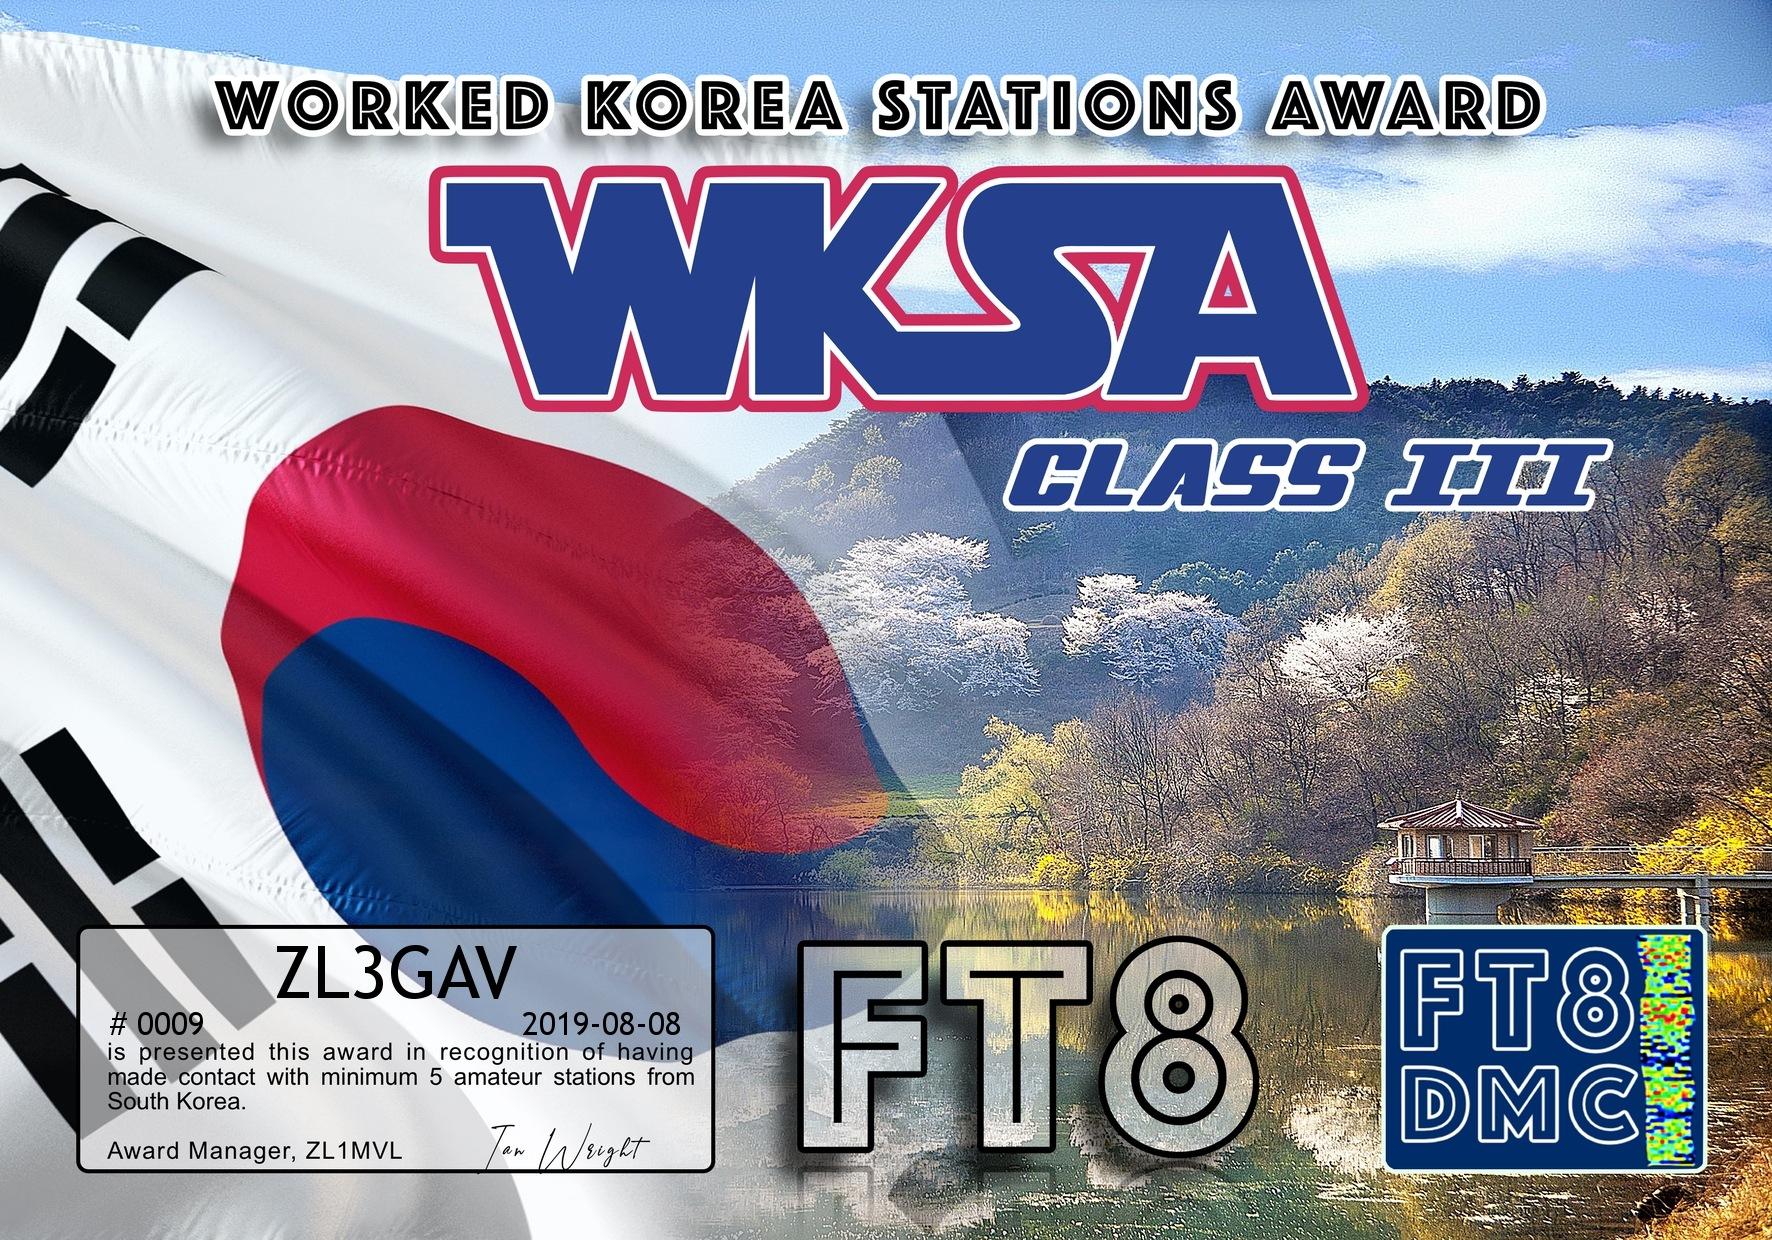 ZL3GAV-WKSA-III.jpg